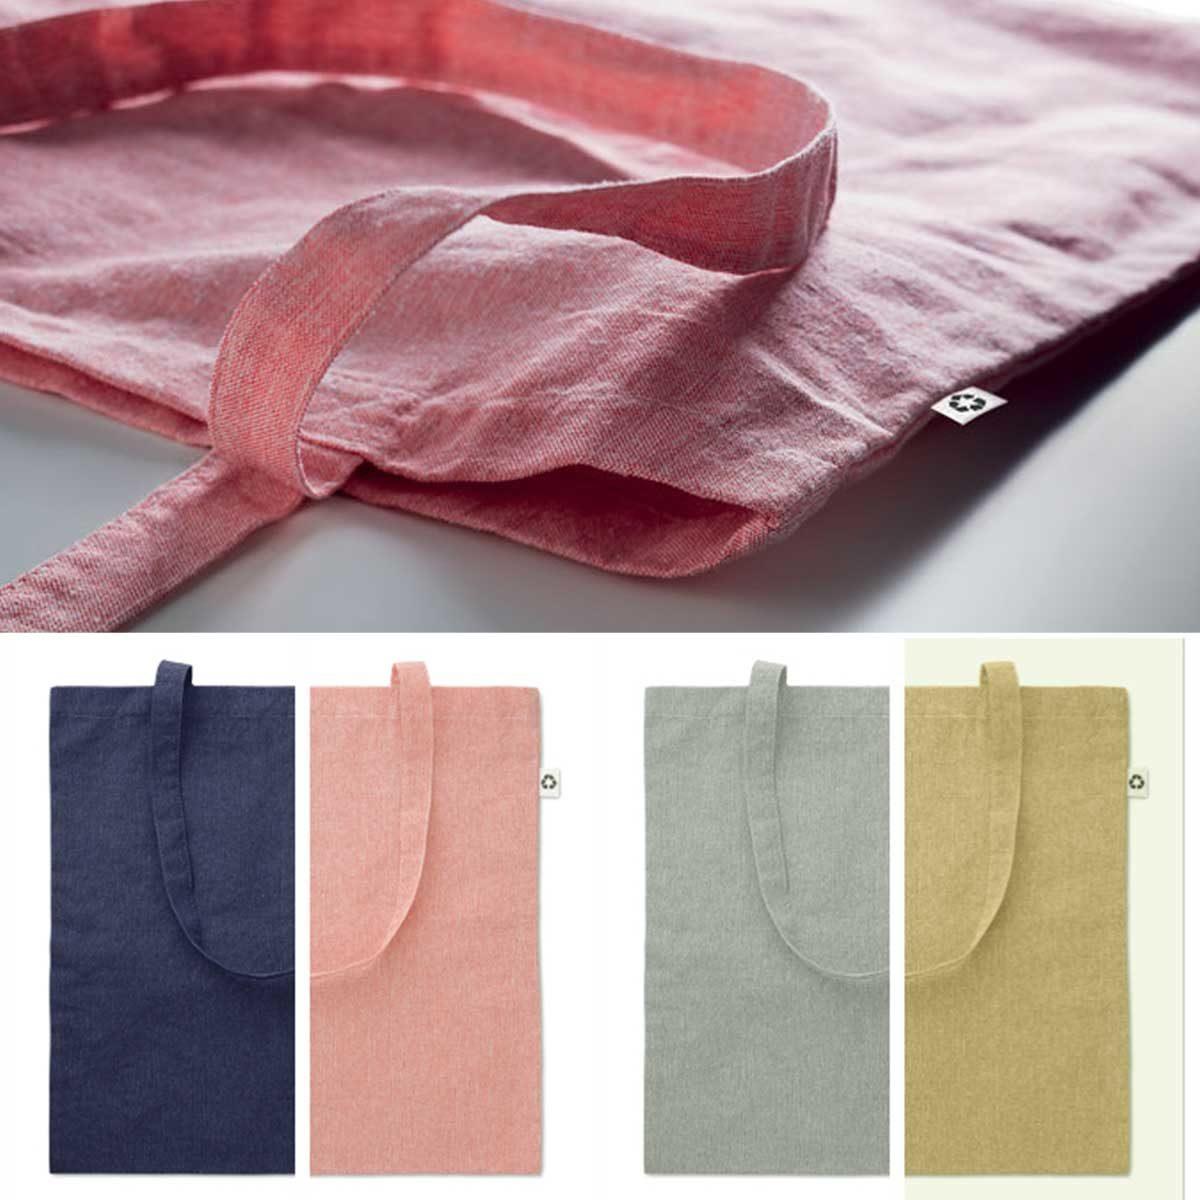 Cotton Jean Bag